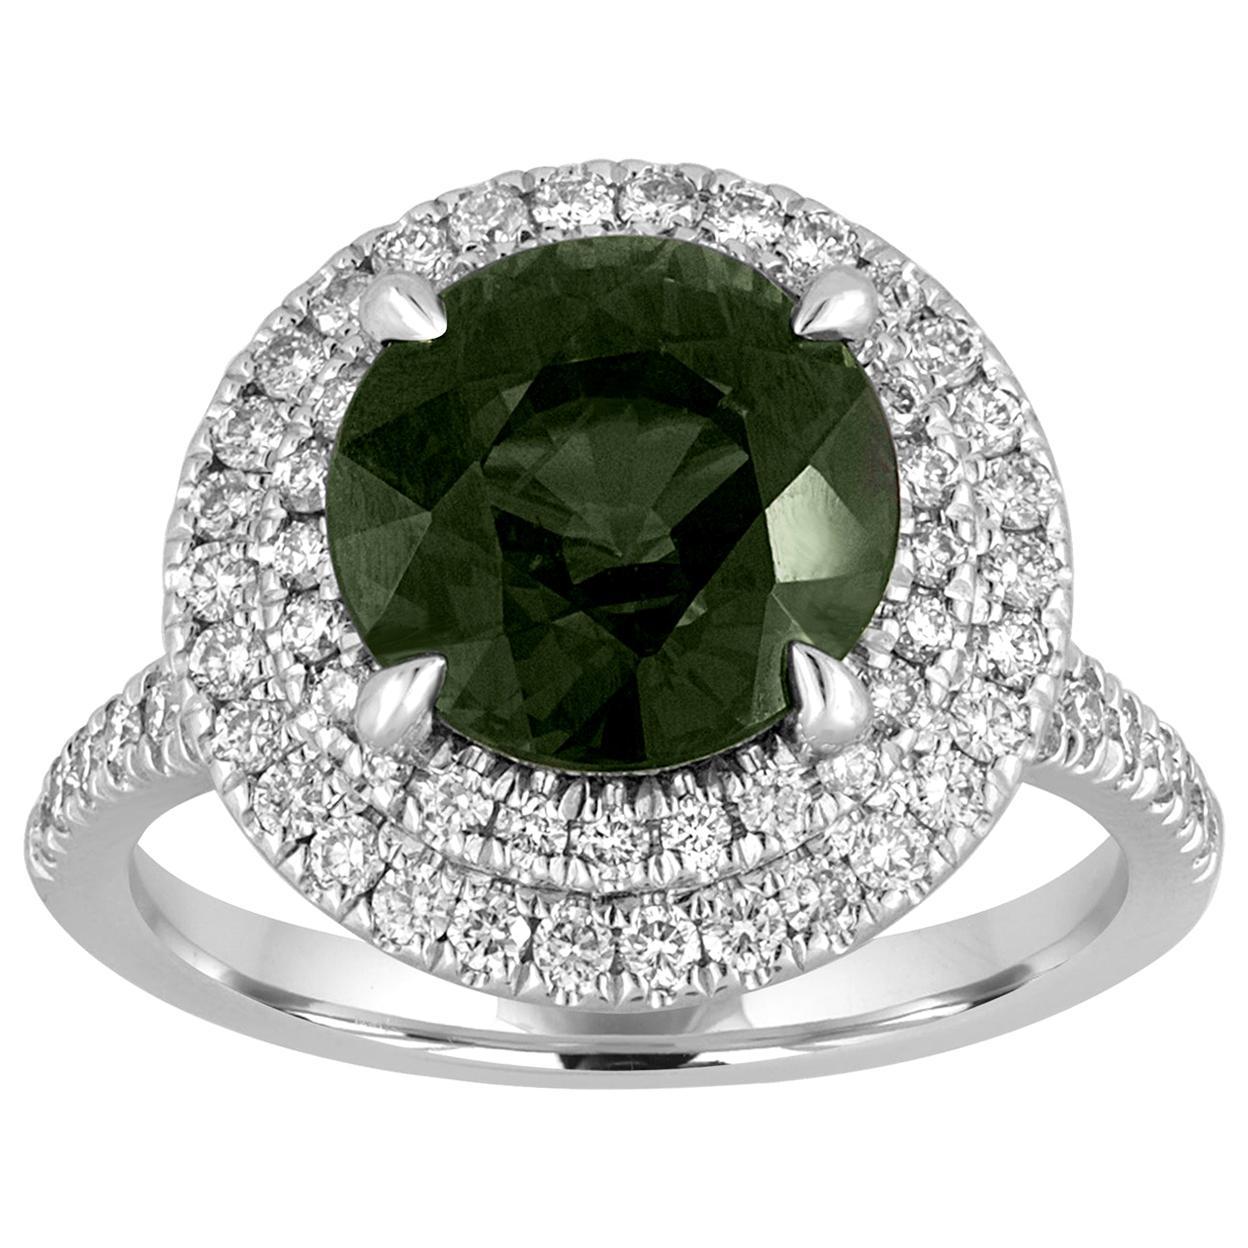 Certified No Heat 5.27 Carat Bluish Green Sapphire Double Halo Diamond Gold Ring